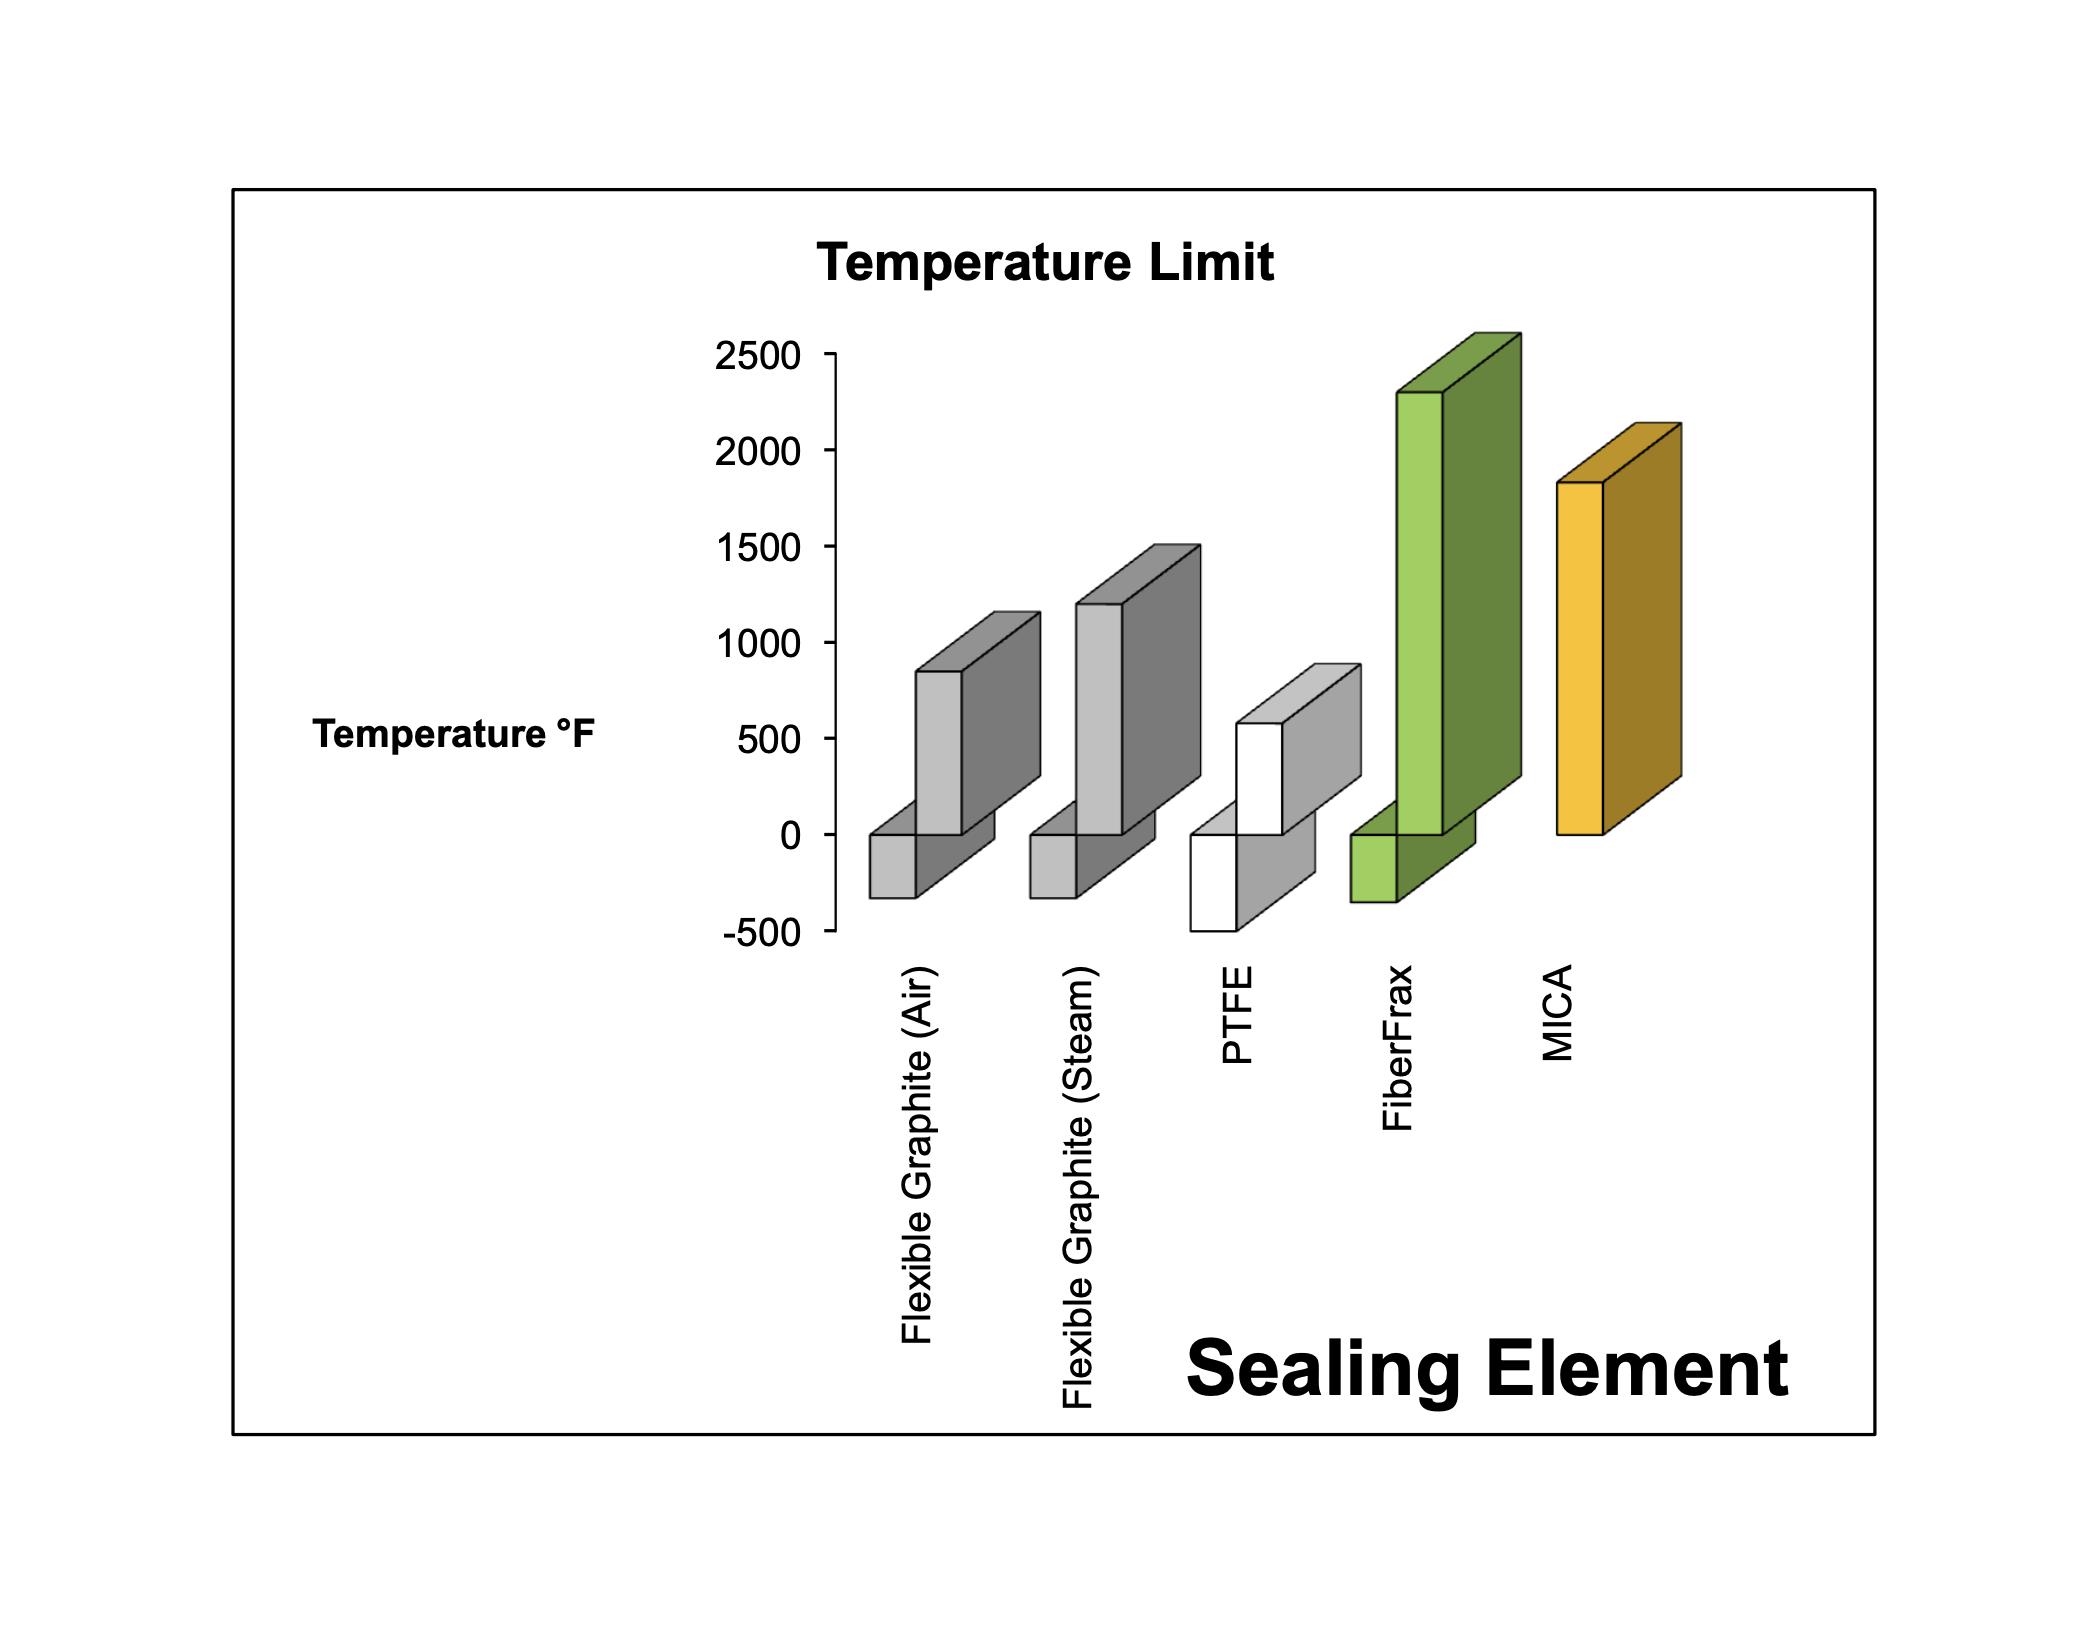 Sealing Temp Limit (F)